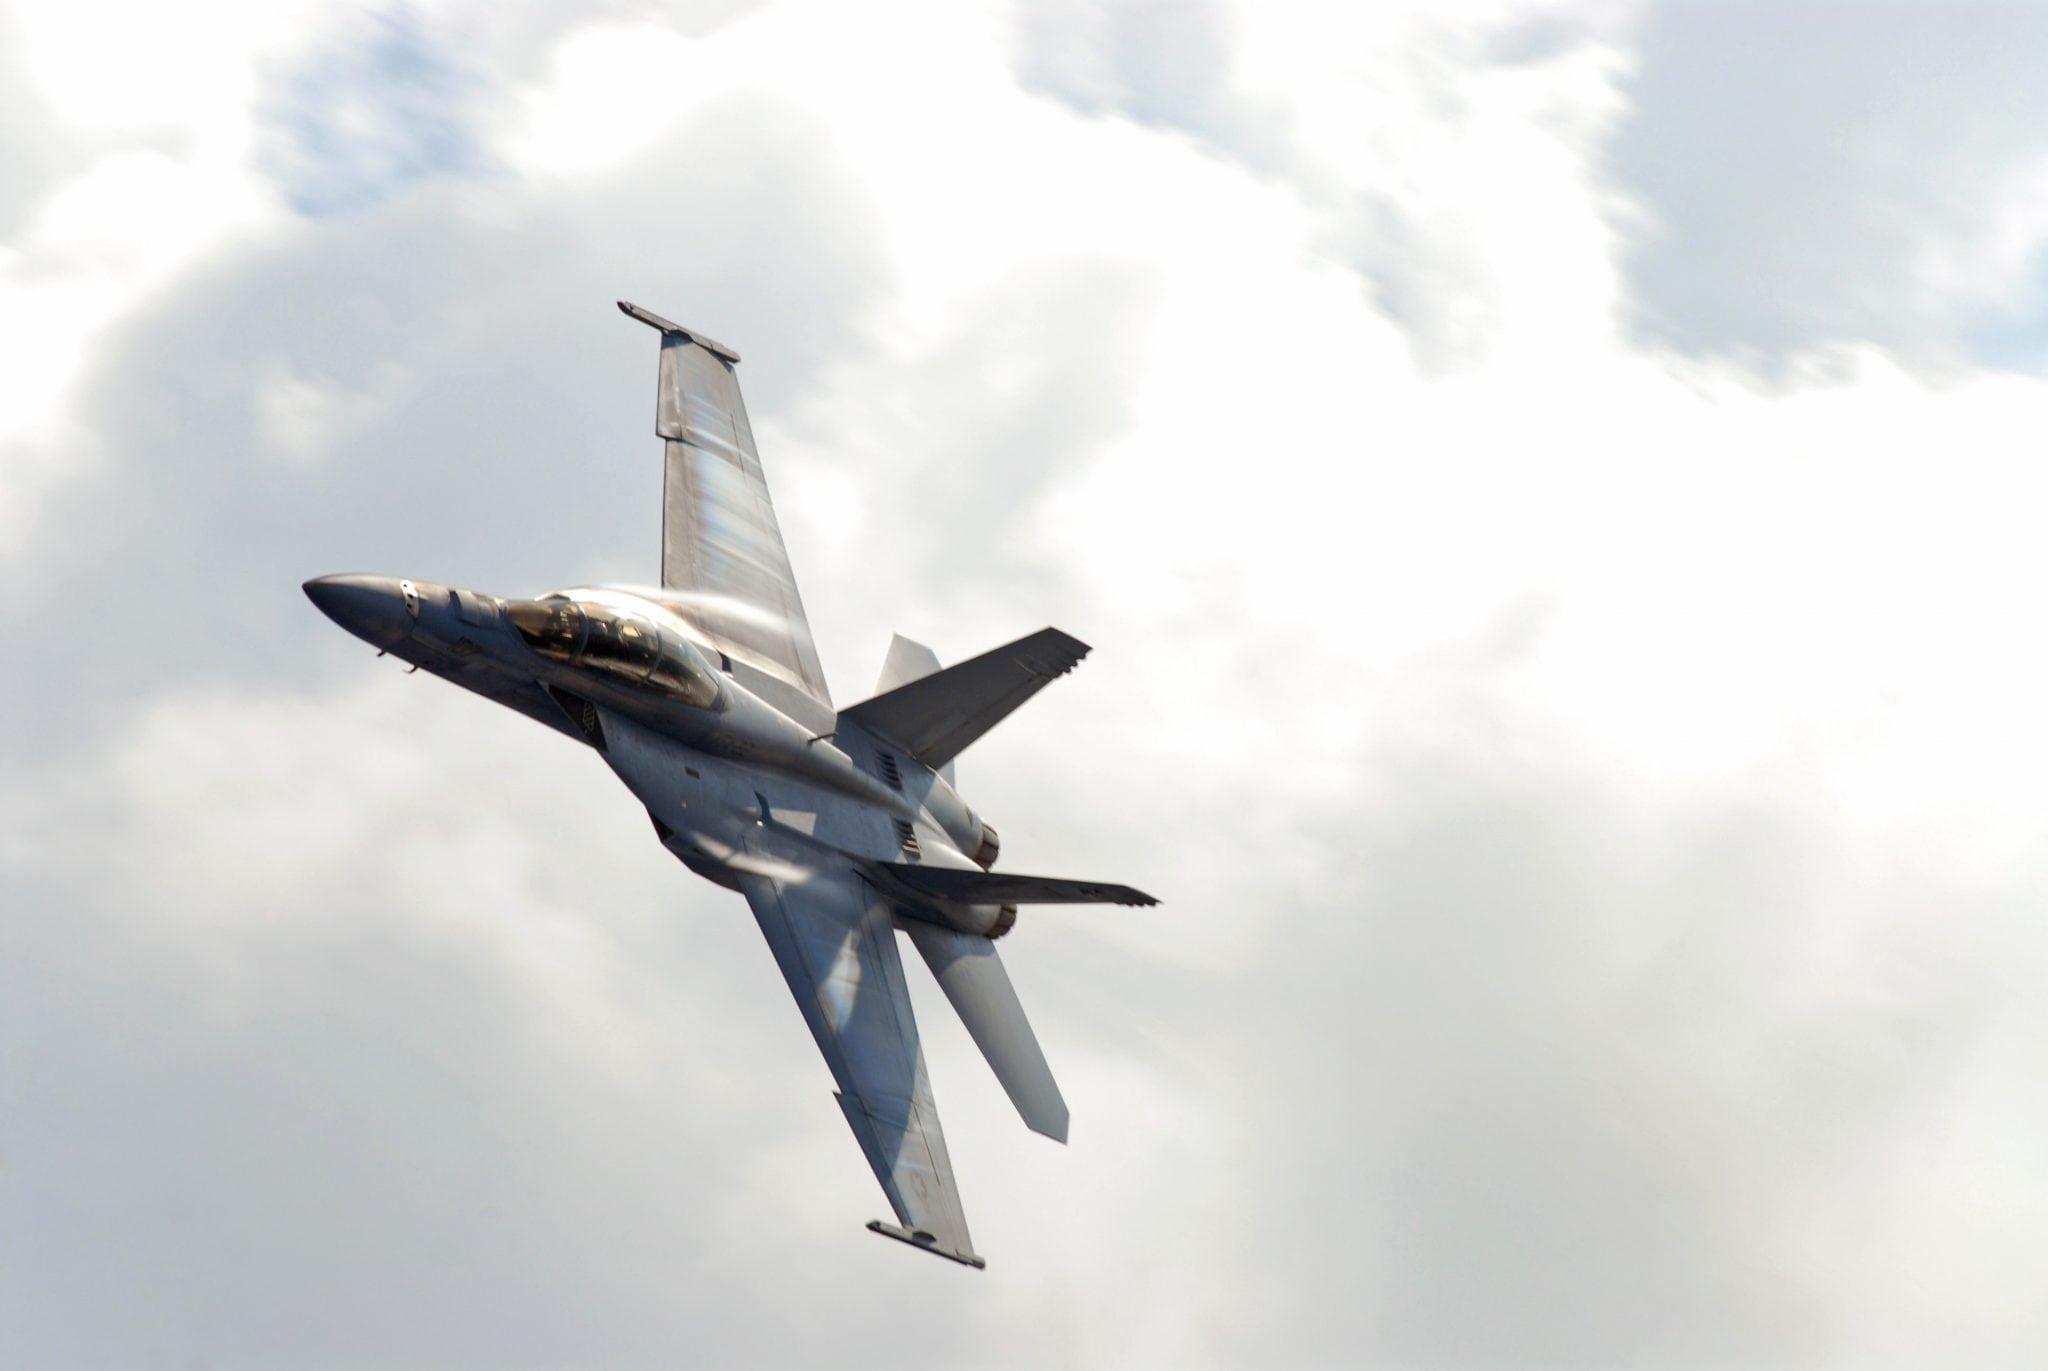 F/A-18 Super Hornet. Photo: Boeing